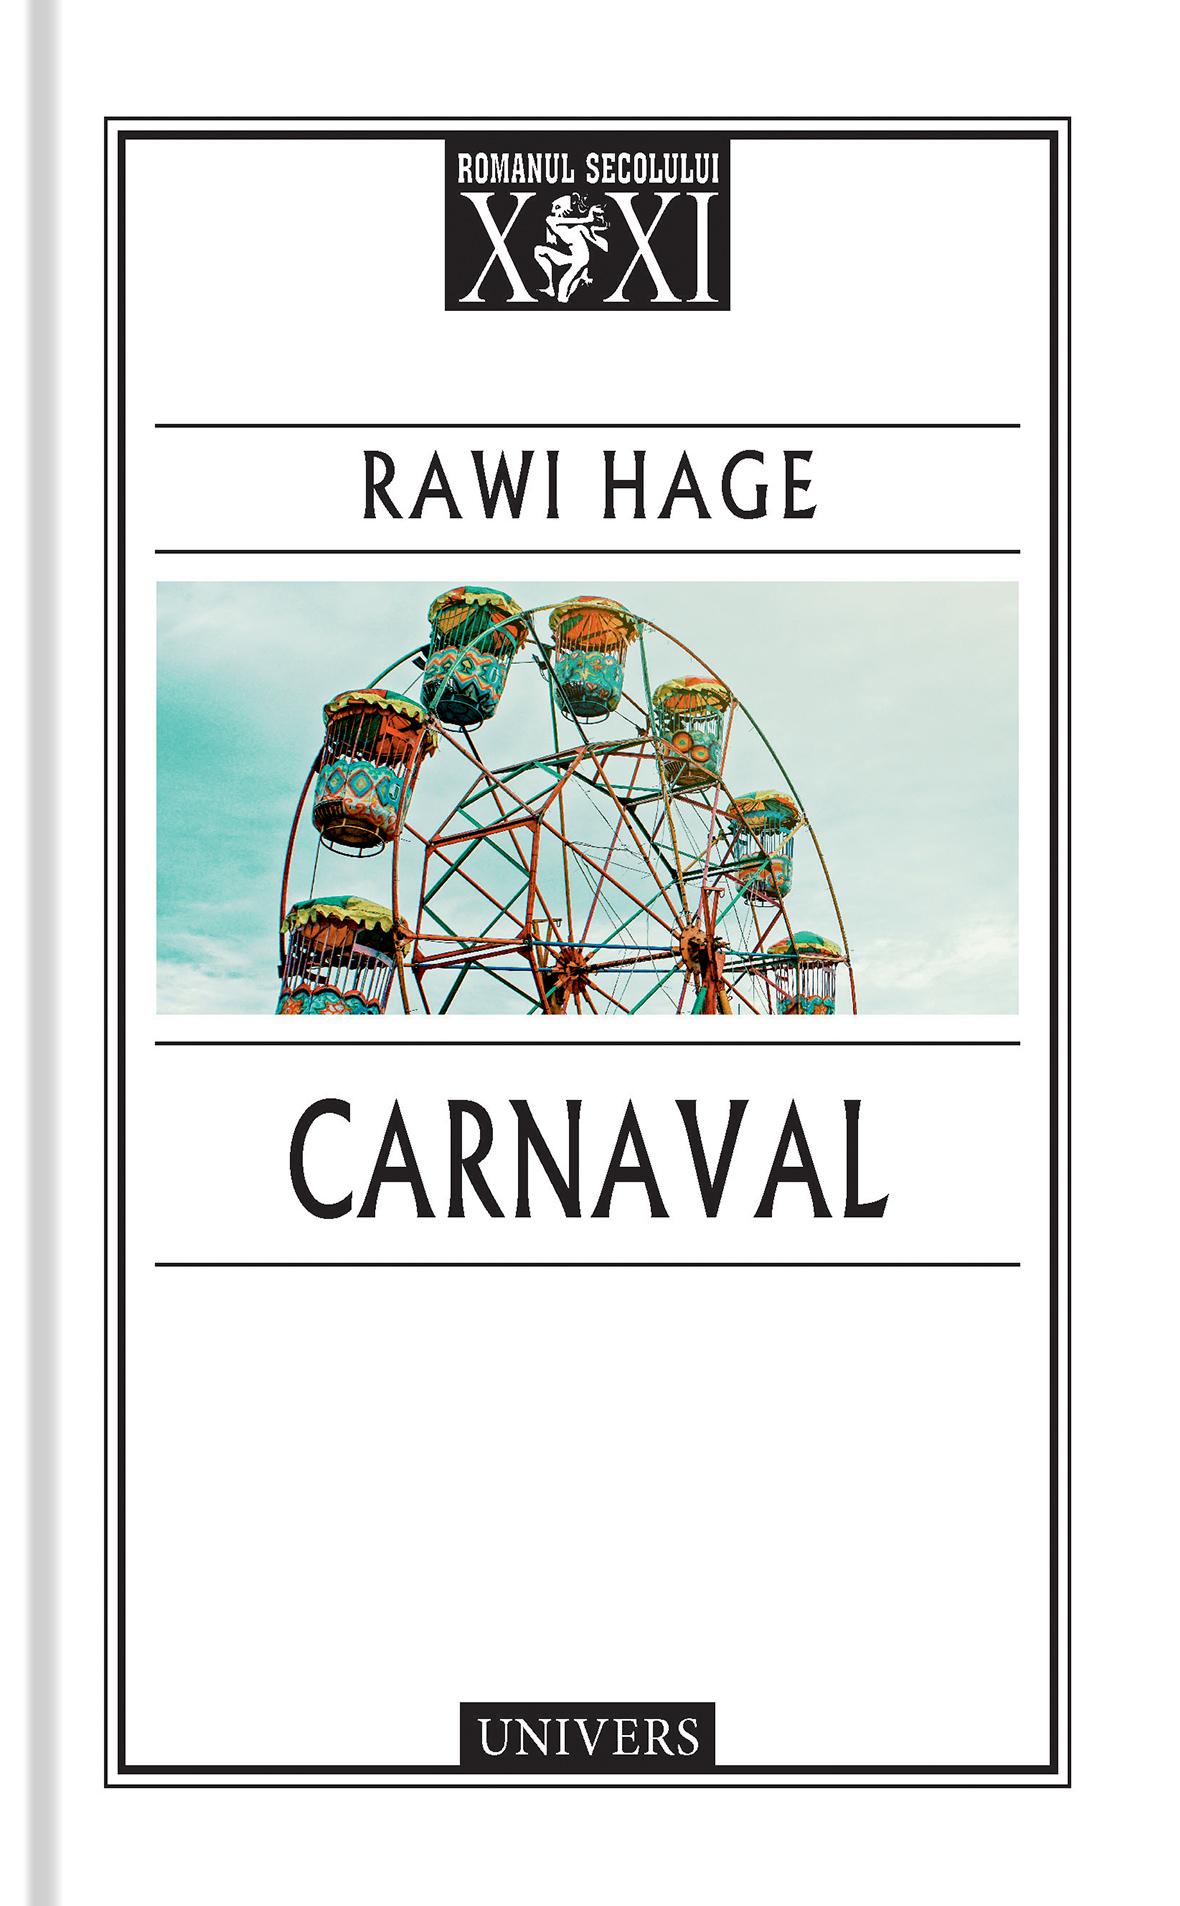 Carnaval | Rawi Hage